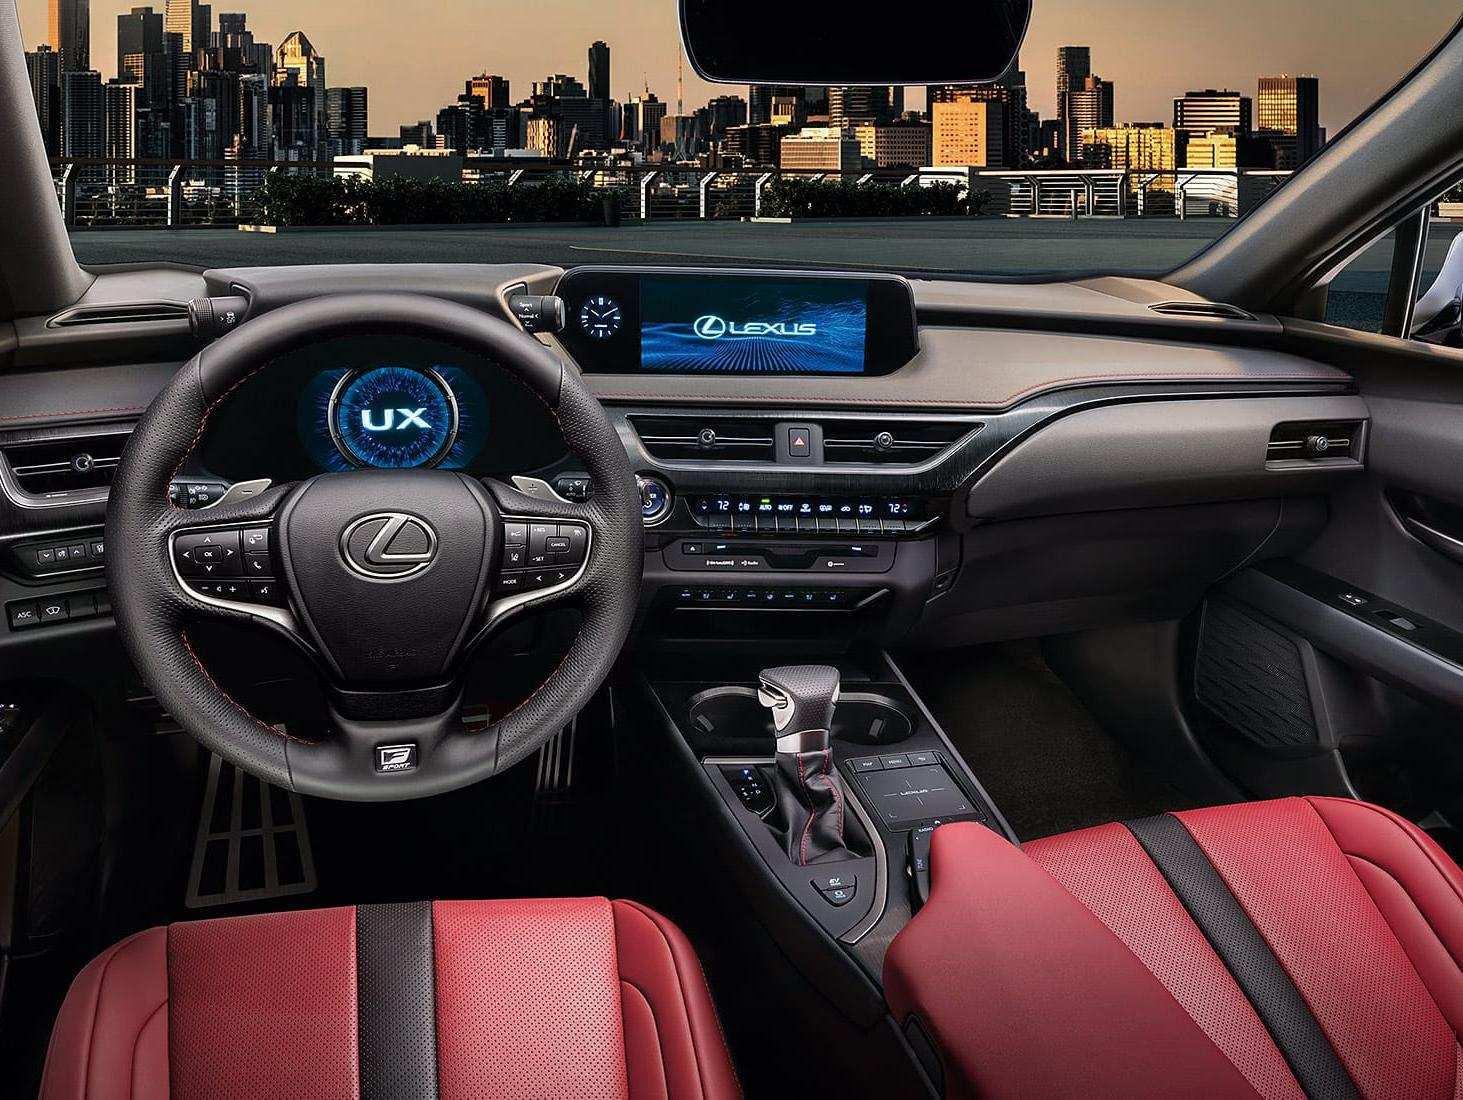 56 All New Ux Lexus 2020 Redesign by Ux Lexus 2020